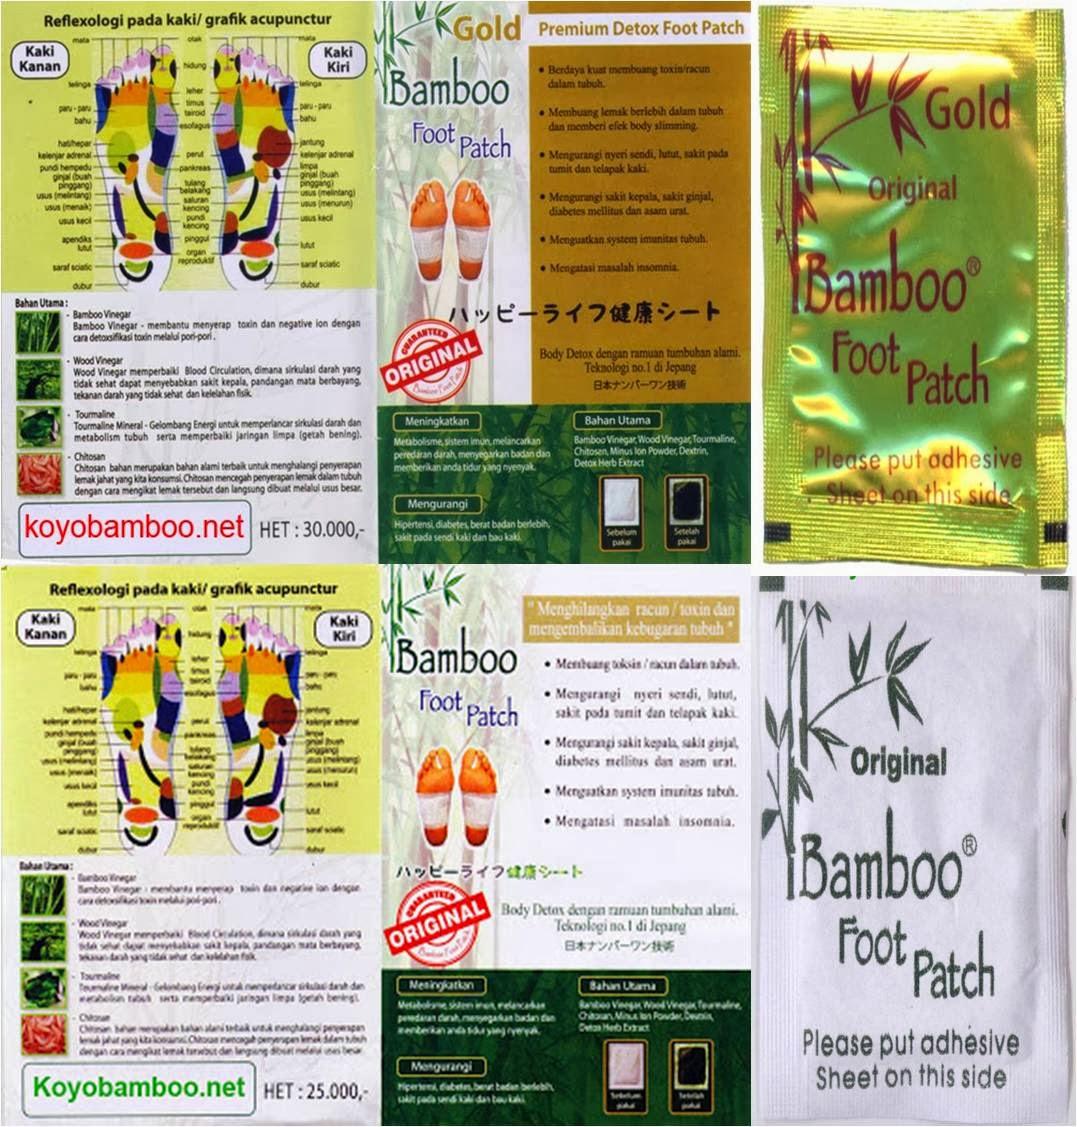 Cy Beauty Shop Koyo Bamboo Gold Original Detox Manfaat Bagi Kesehatan